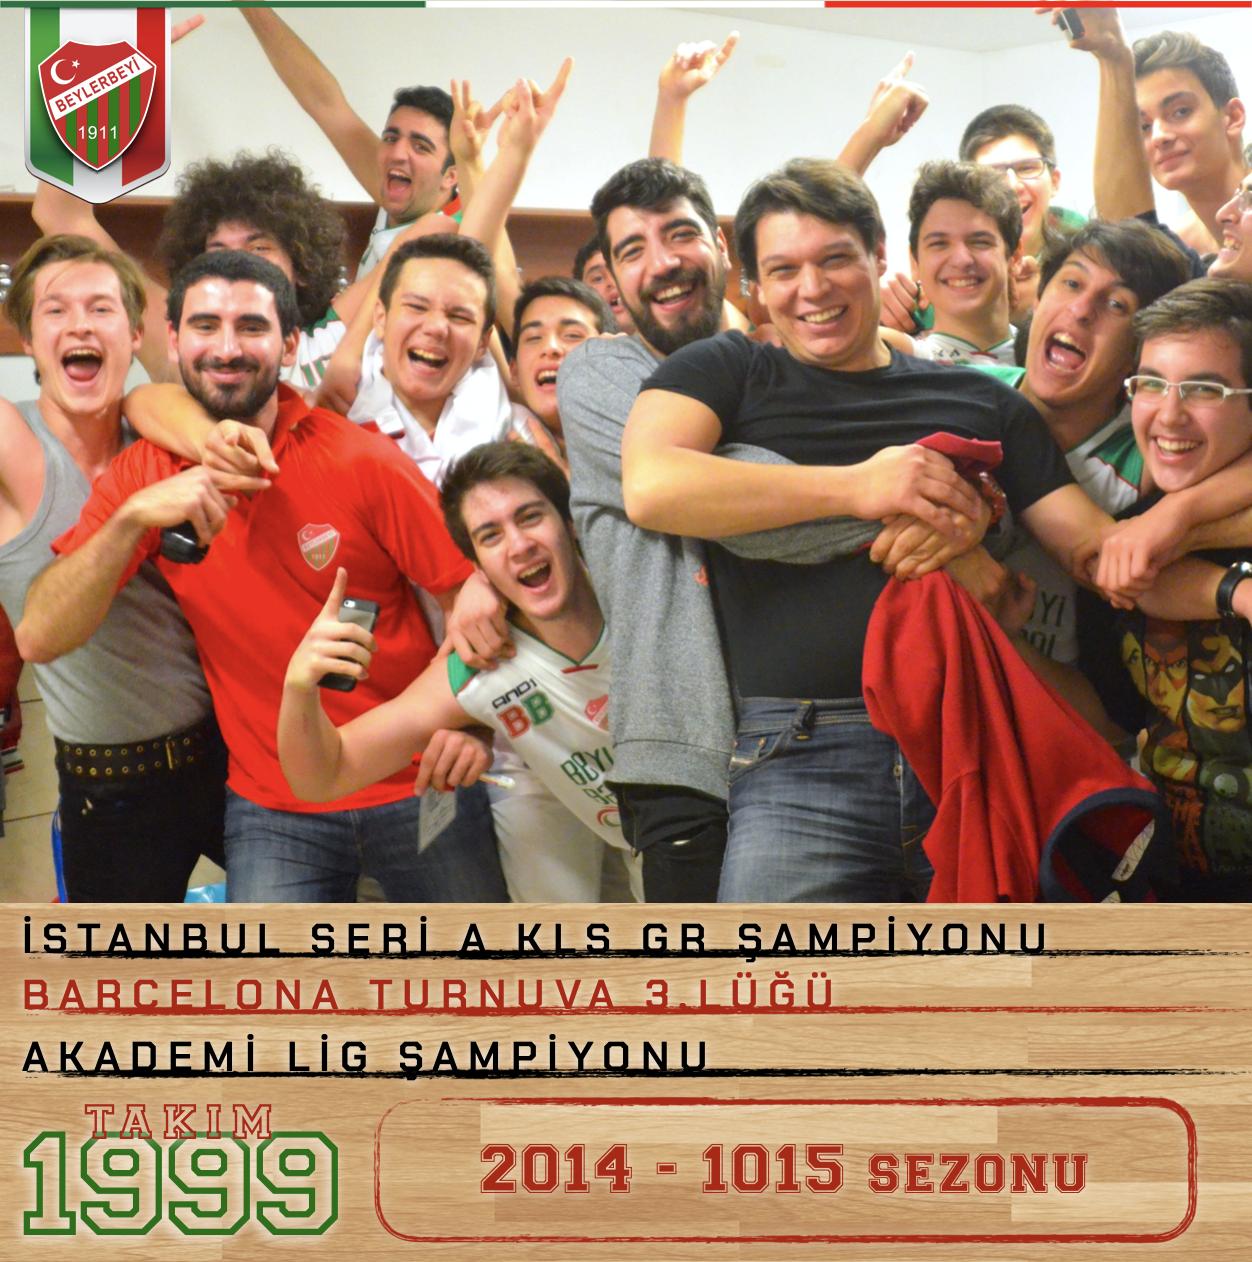 2014-2015 TBF SERİ A KLS ŞAMPİYONU BEYLERBEYİ YILDIZ A (1999)